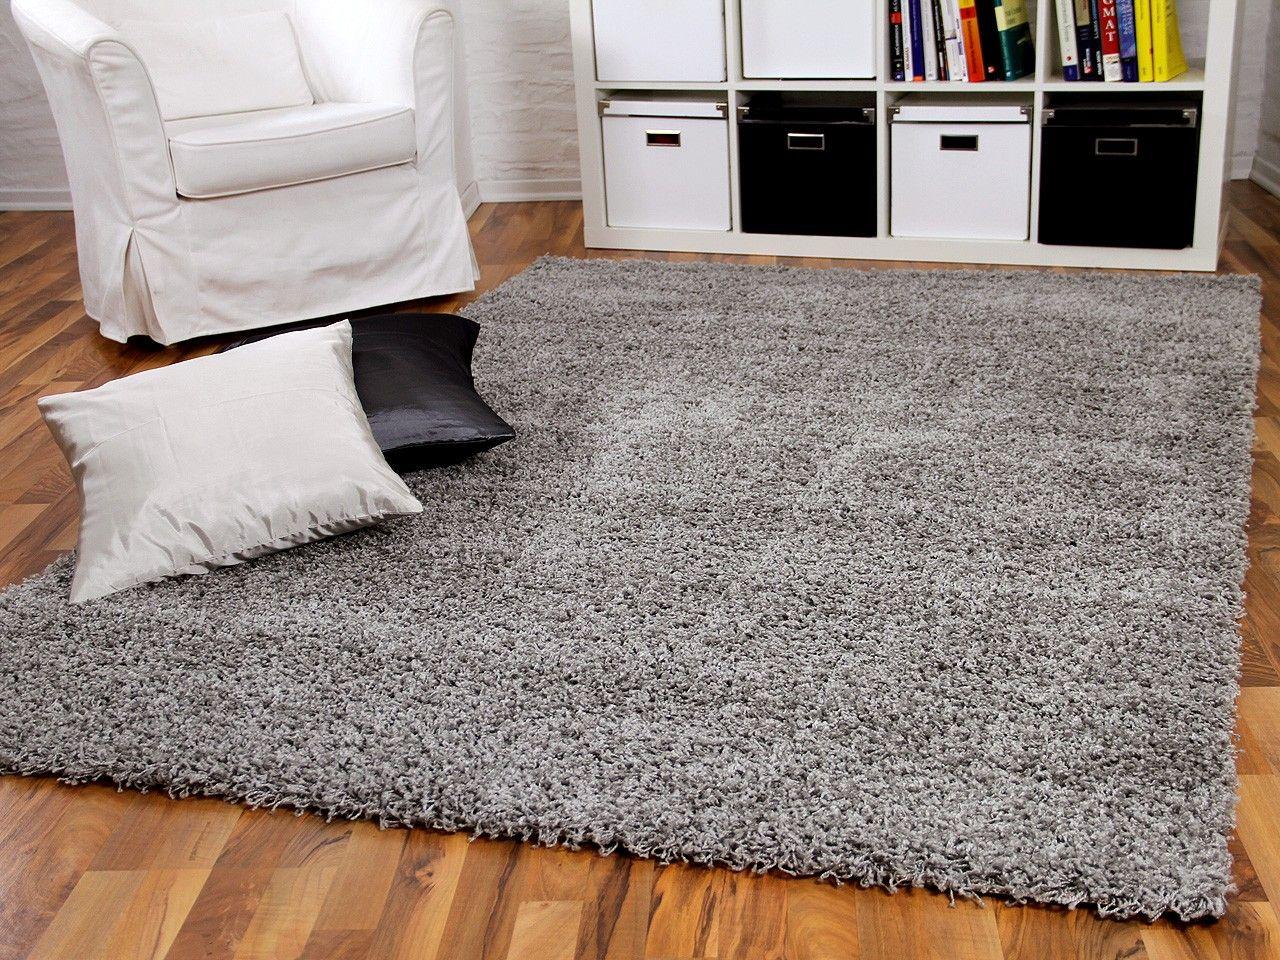 Hochflor Langflor Shaggy Teppich Aloha Grau Mit Bildern Teppich Kinderzimmer Teppich Grau Teppich